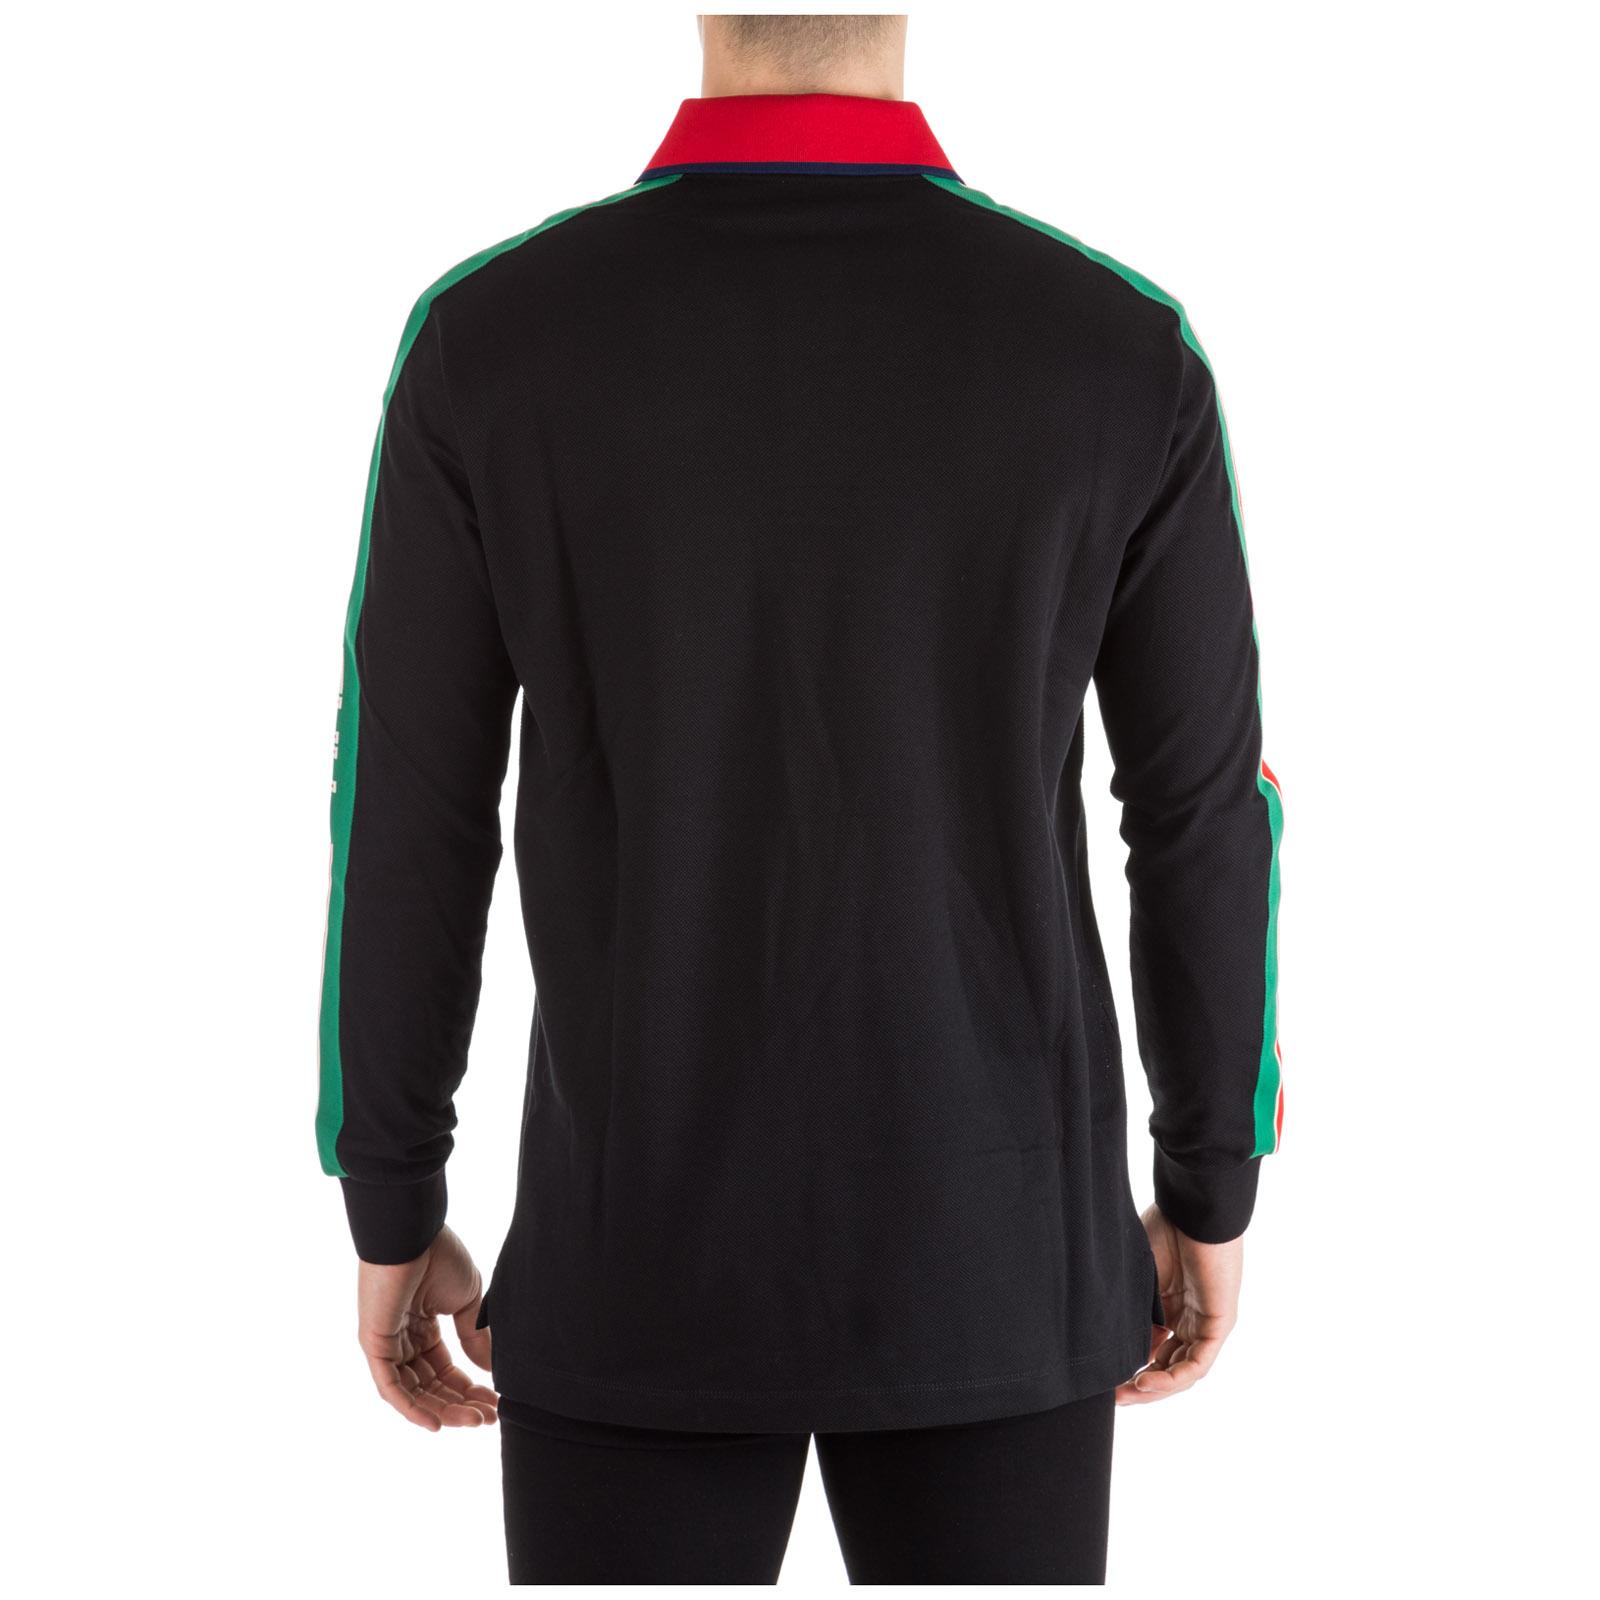 51e2a950903 Long sleeve polo shirt gucci xjag nero jpg 1600x1600 Gucci collar shirt